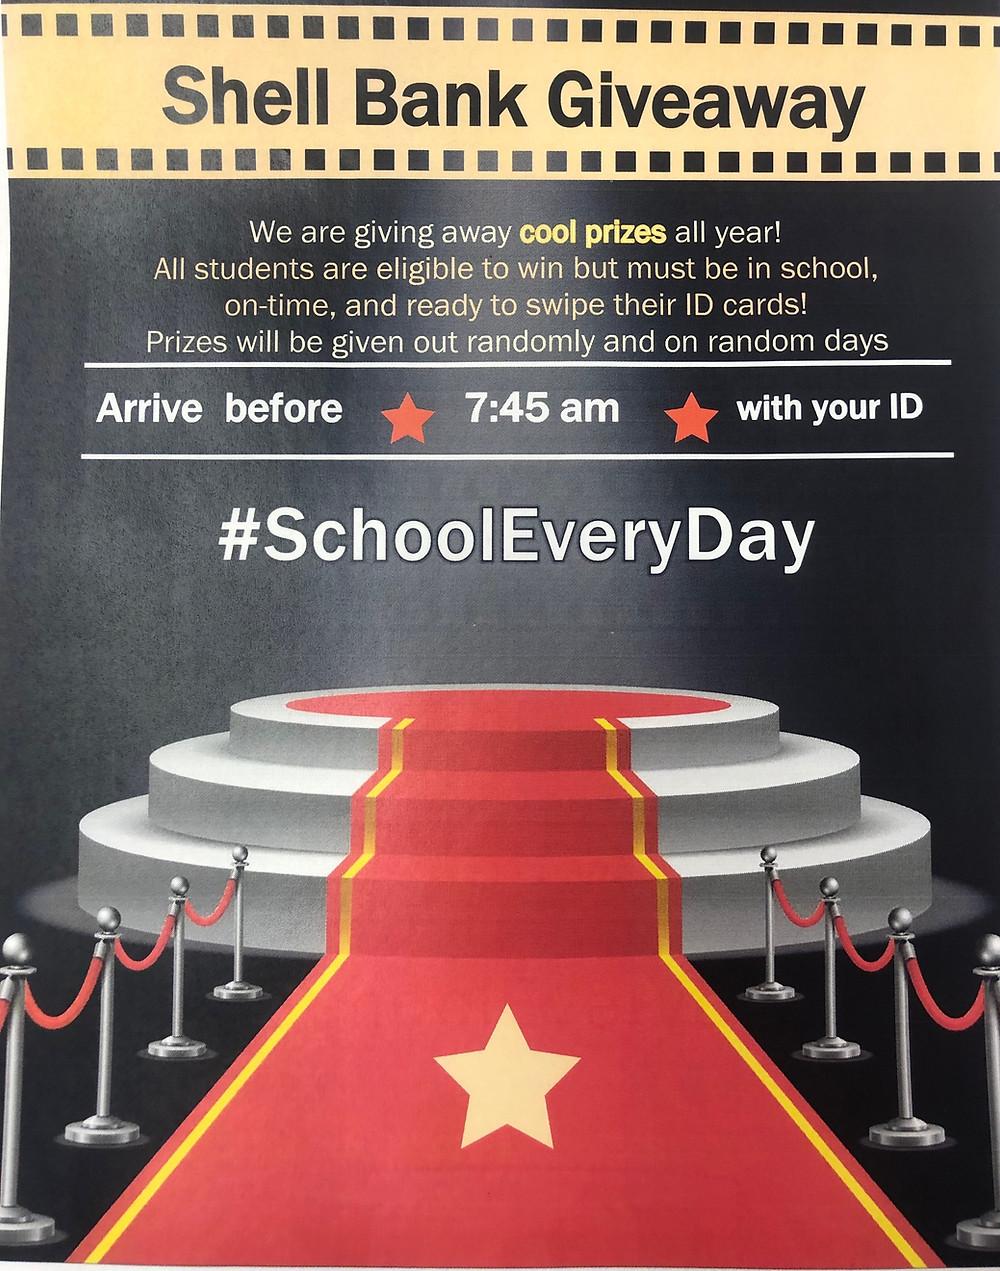 #SchoolEveryDay